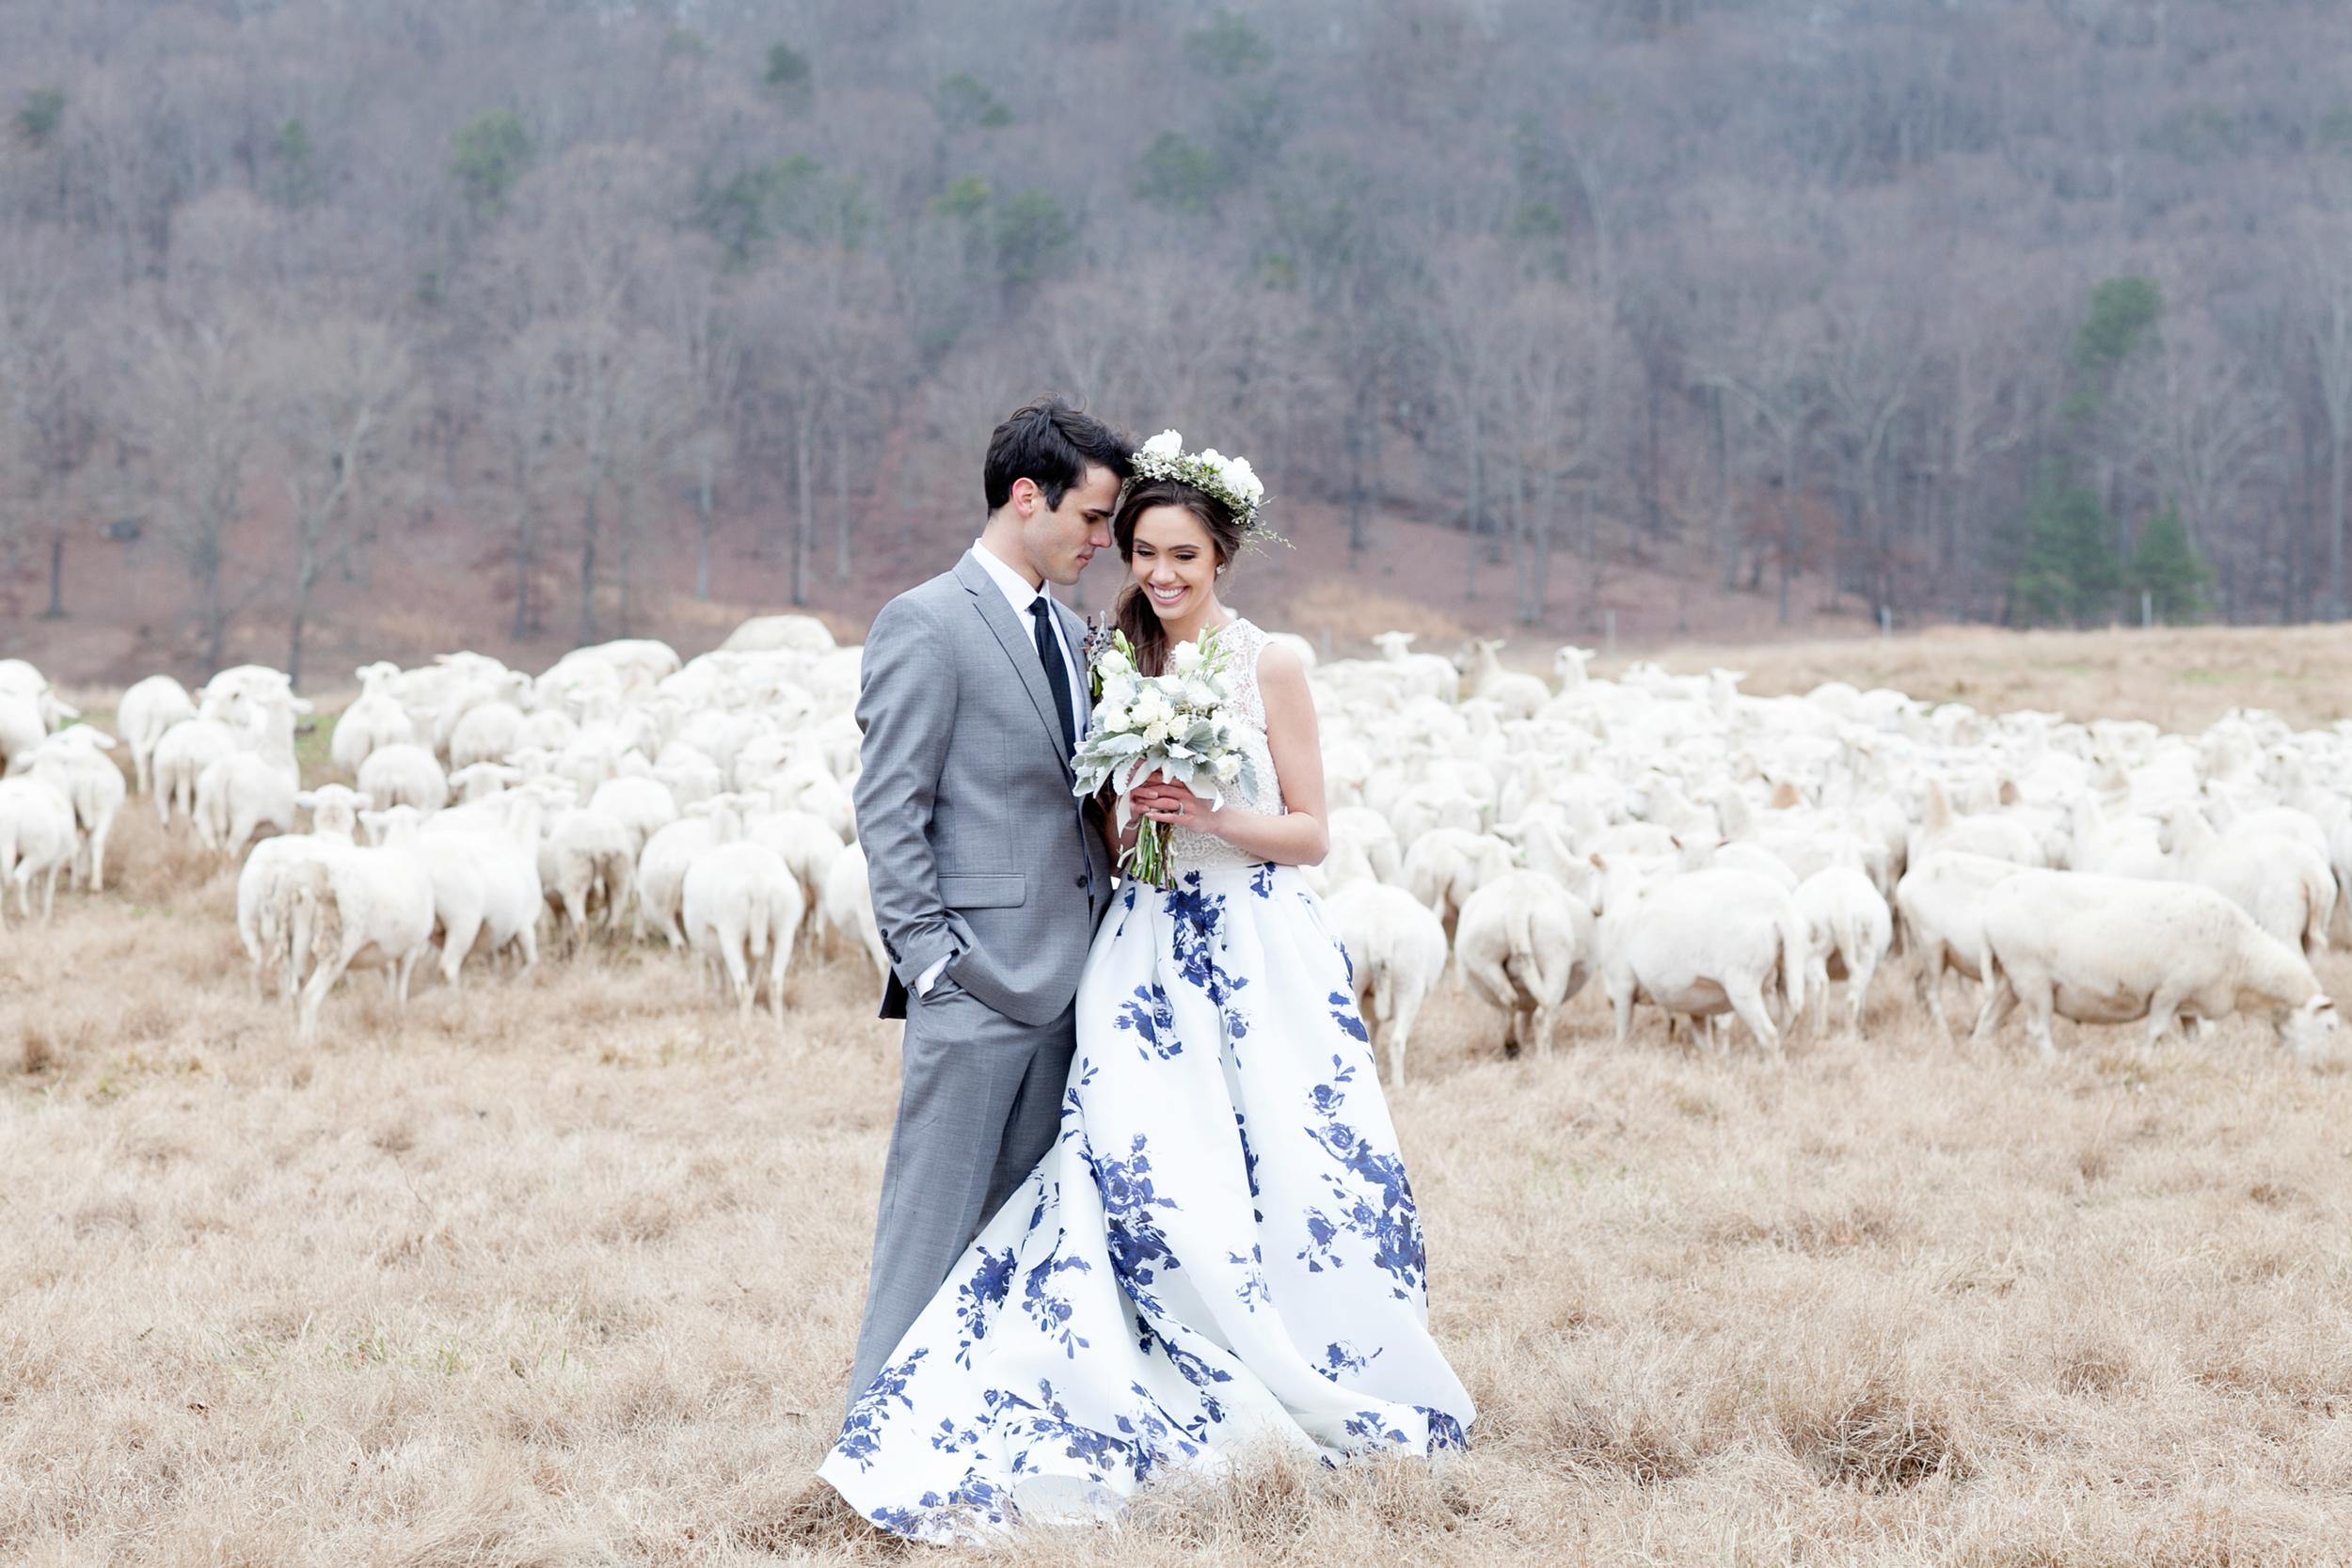 san-francisco-wedding-photographer-sleepy-fox-photography (119 of 343).jpg